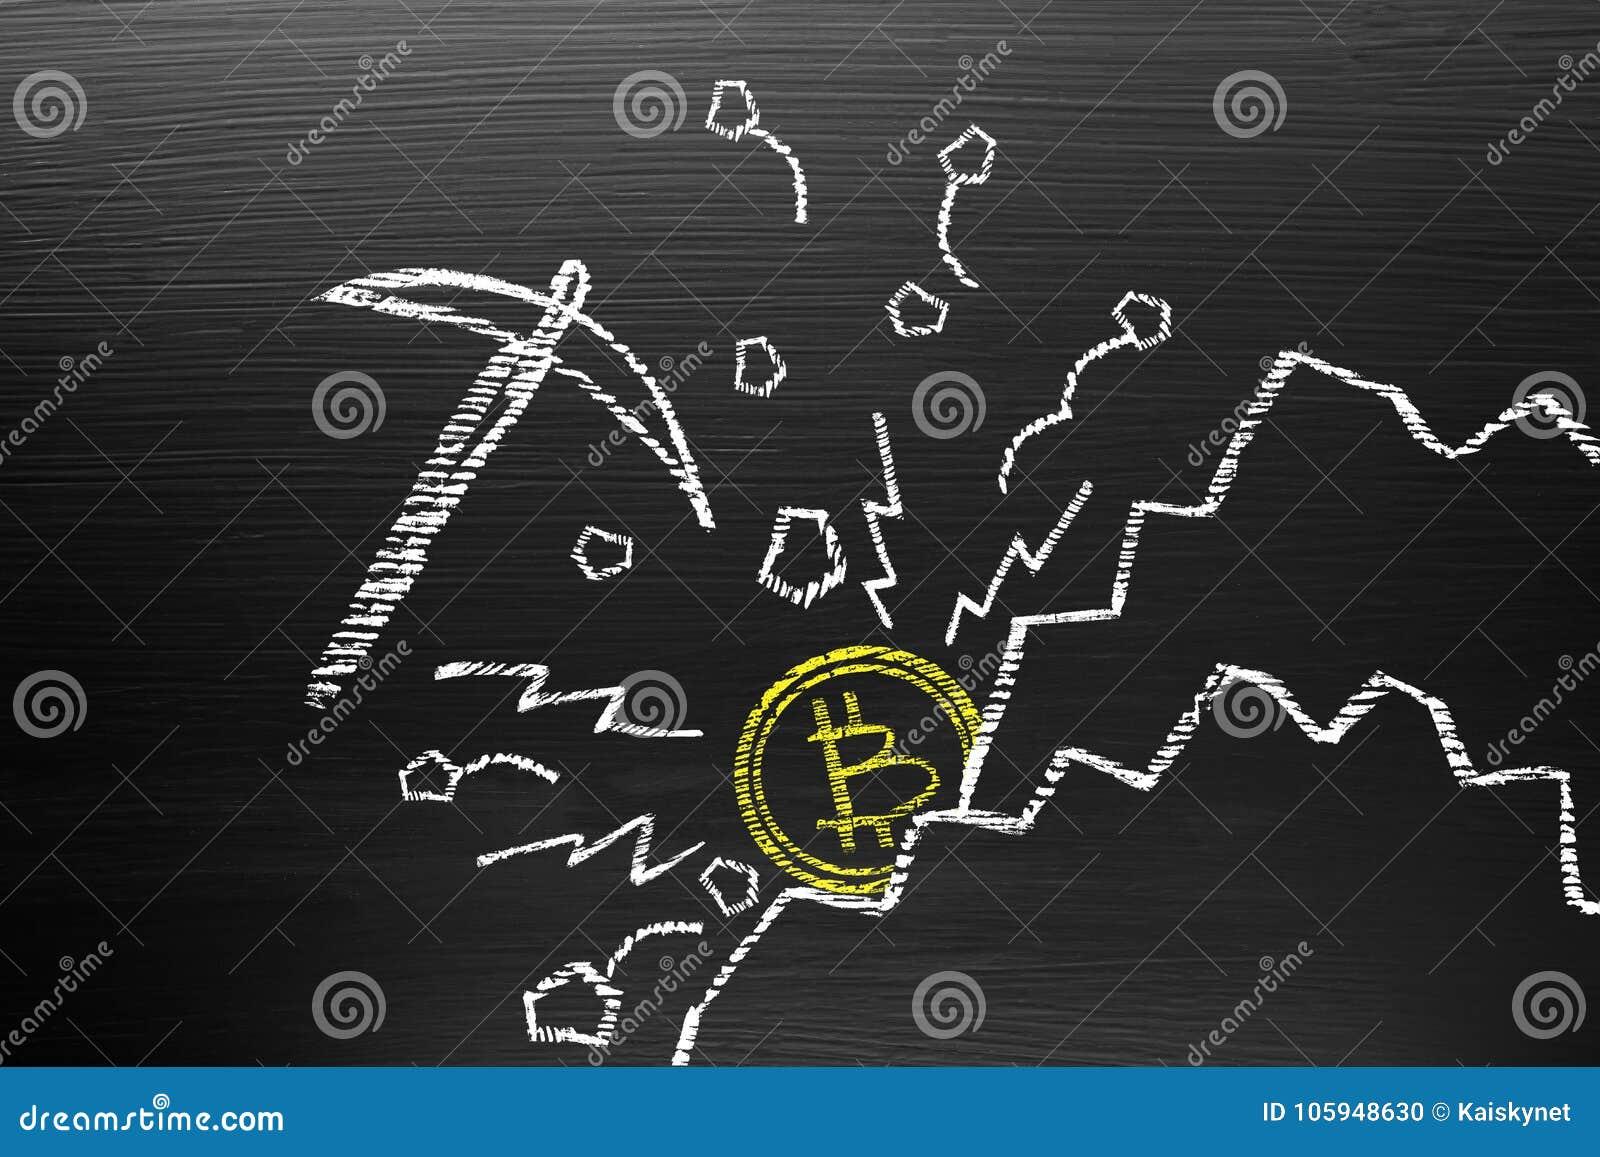 Bitcoin Cryptocurrency概念 在有白垩乱画的黑板上,